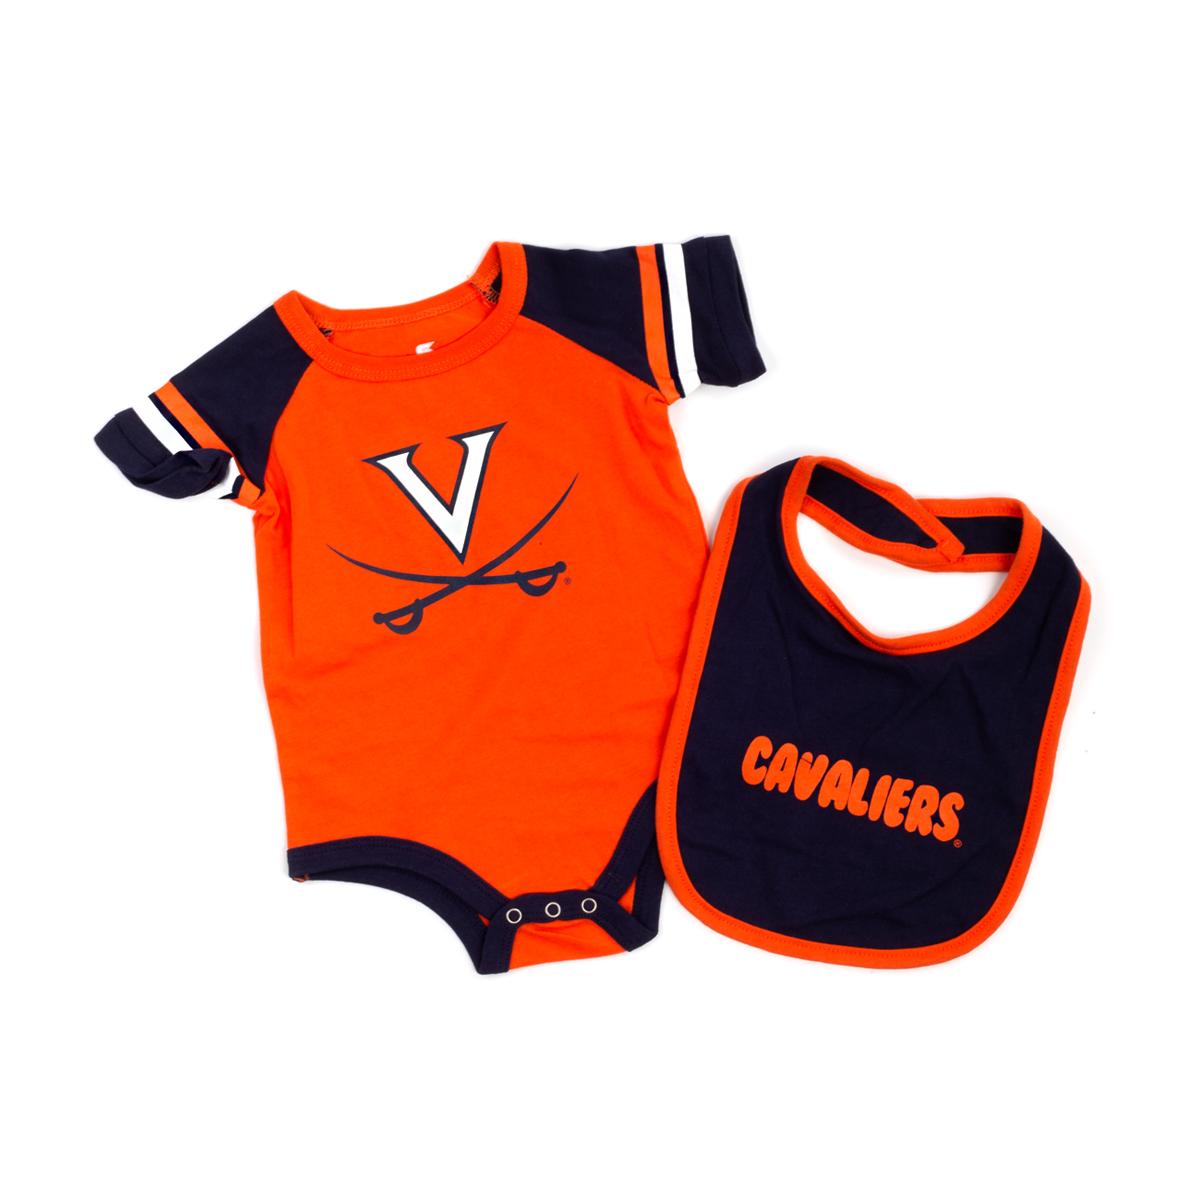 University of Virginia 2018 Infant Roll-Out Onesie & Bib Set